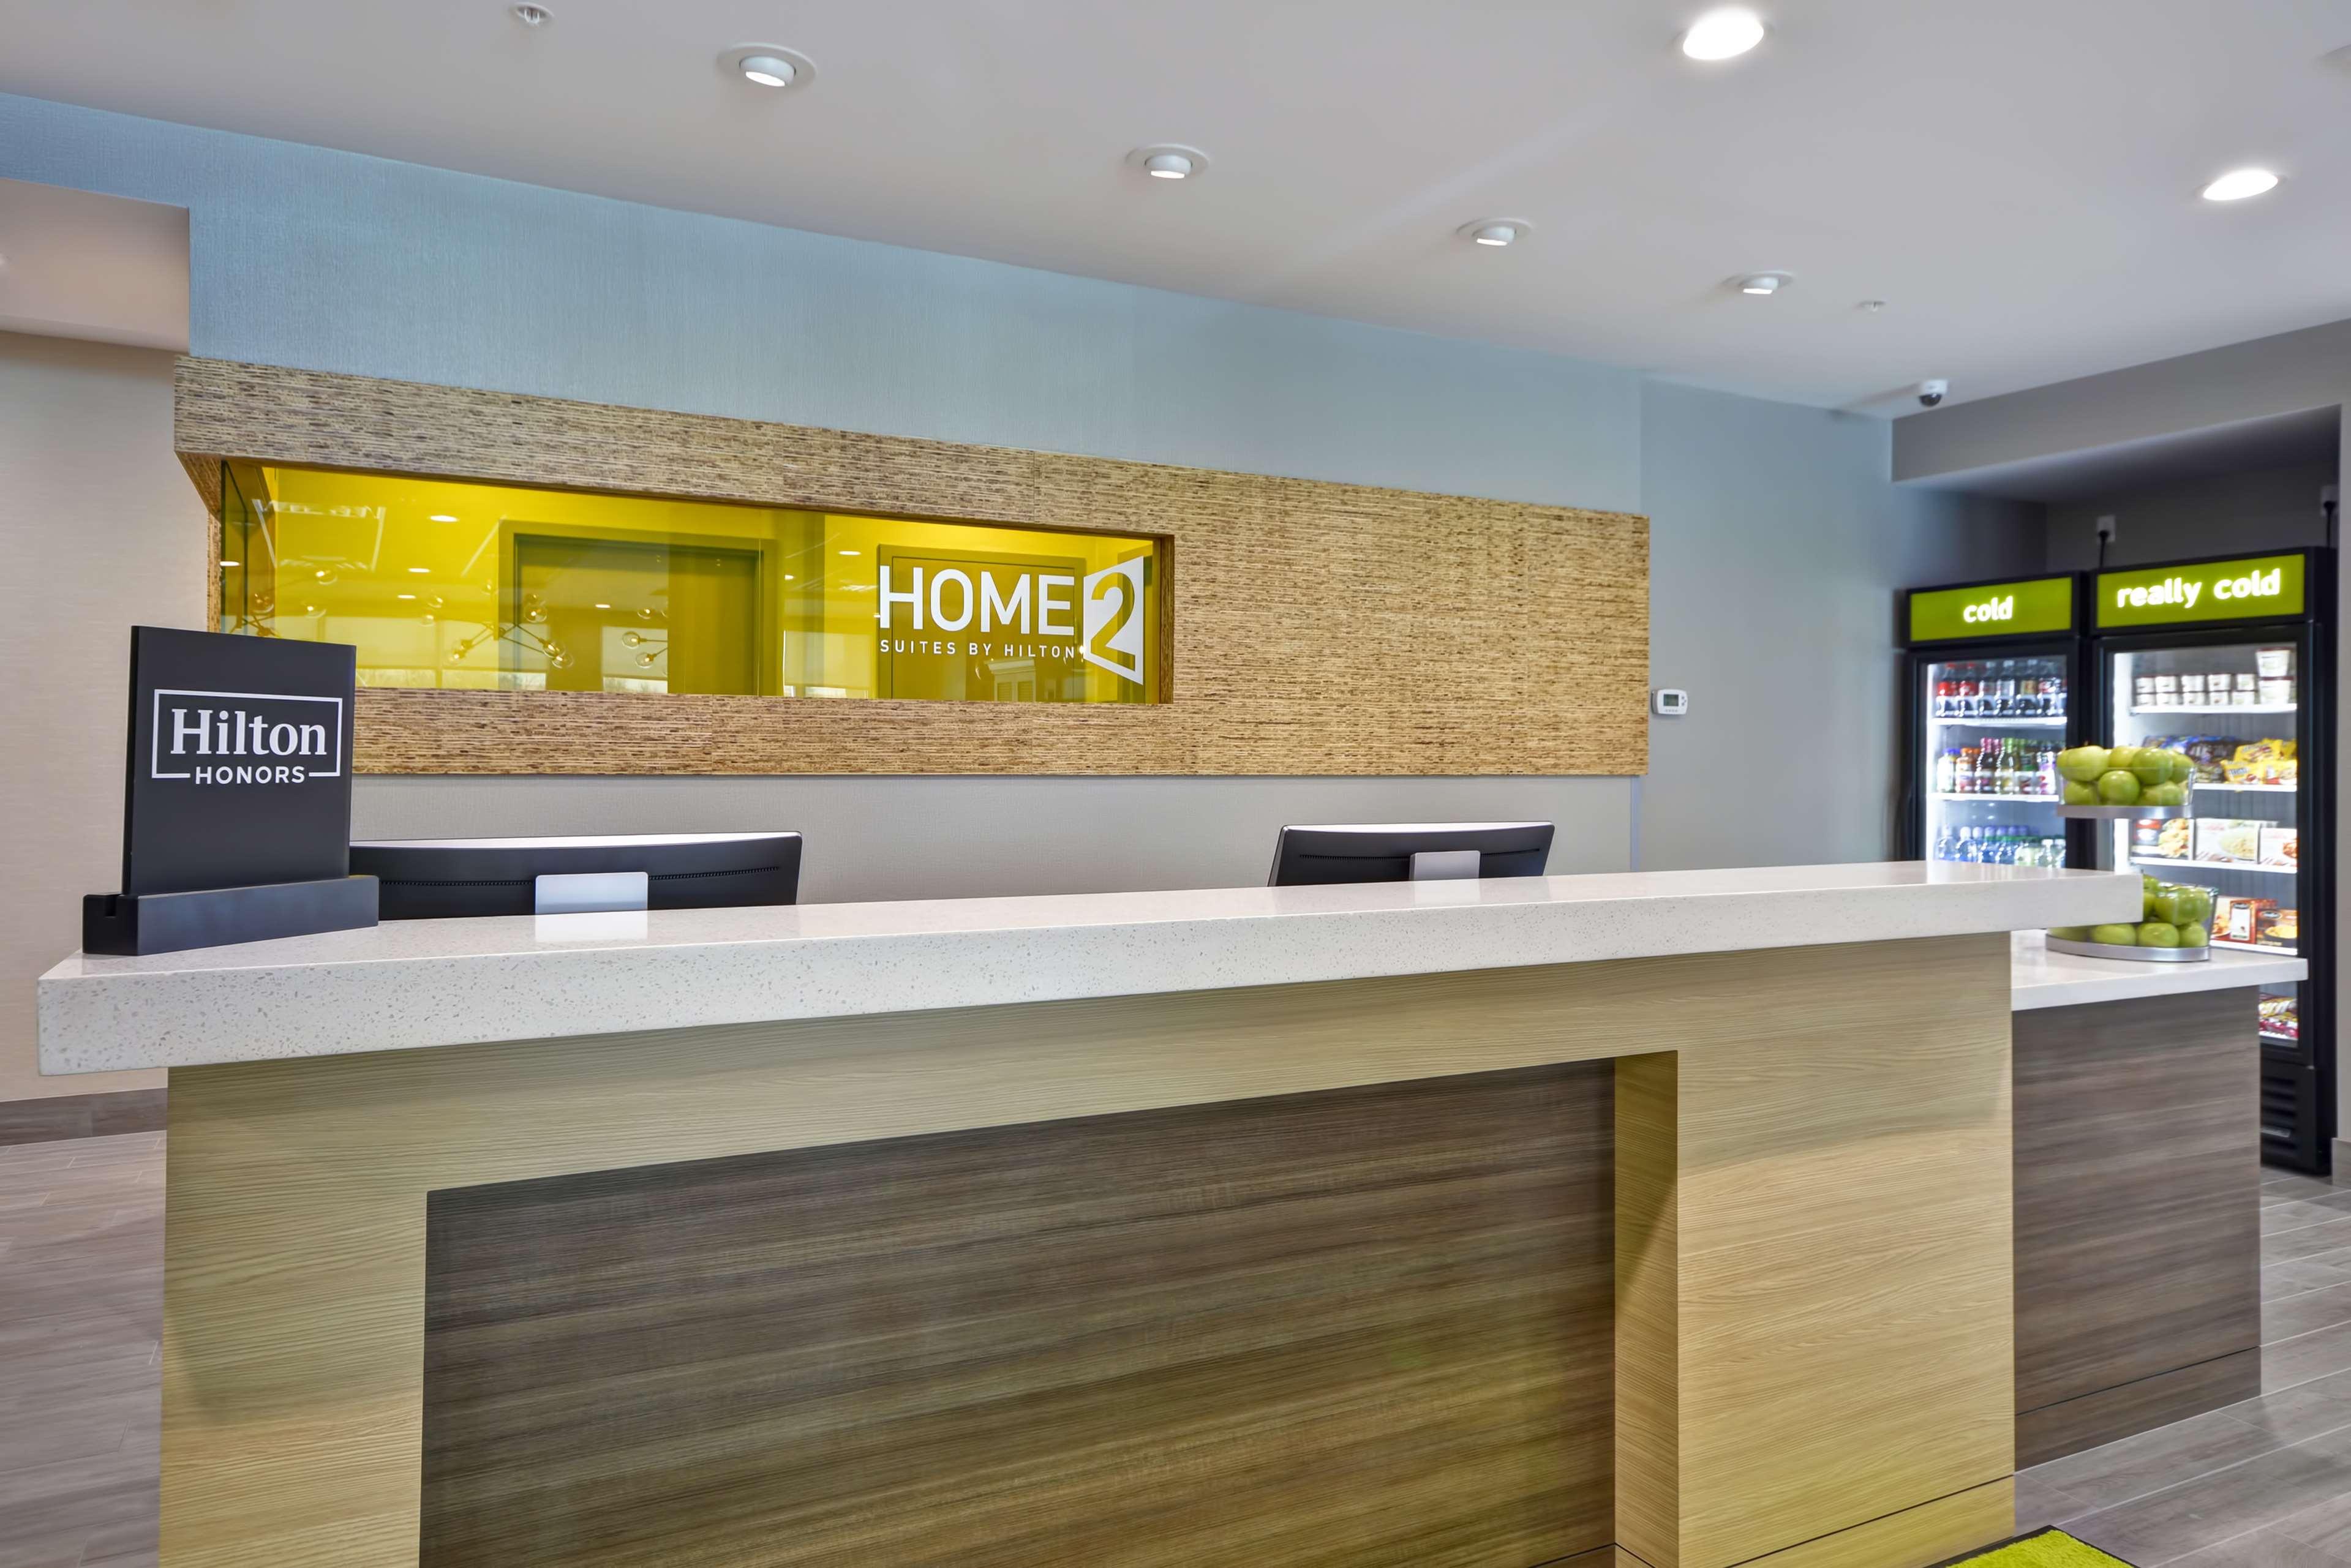 Home2 Suites by Hilton Jackson image 4